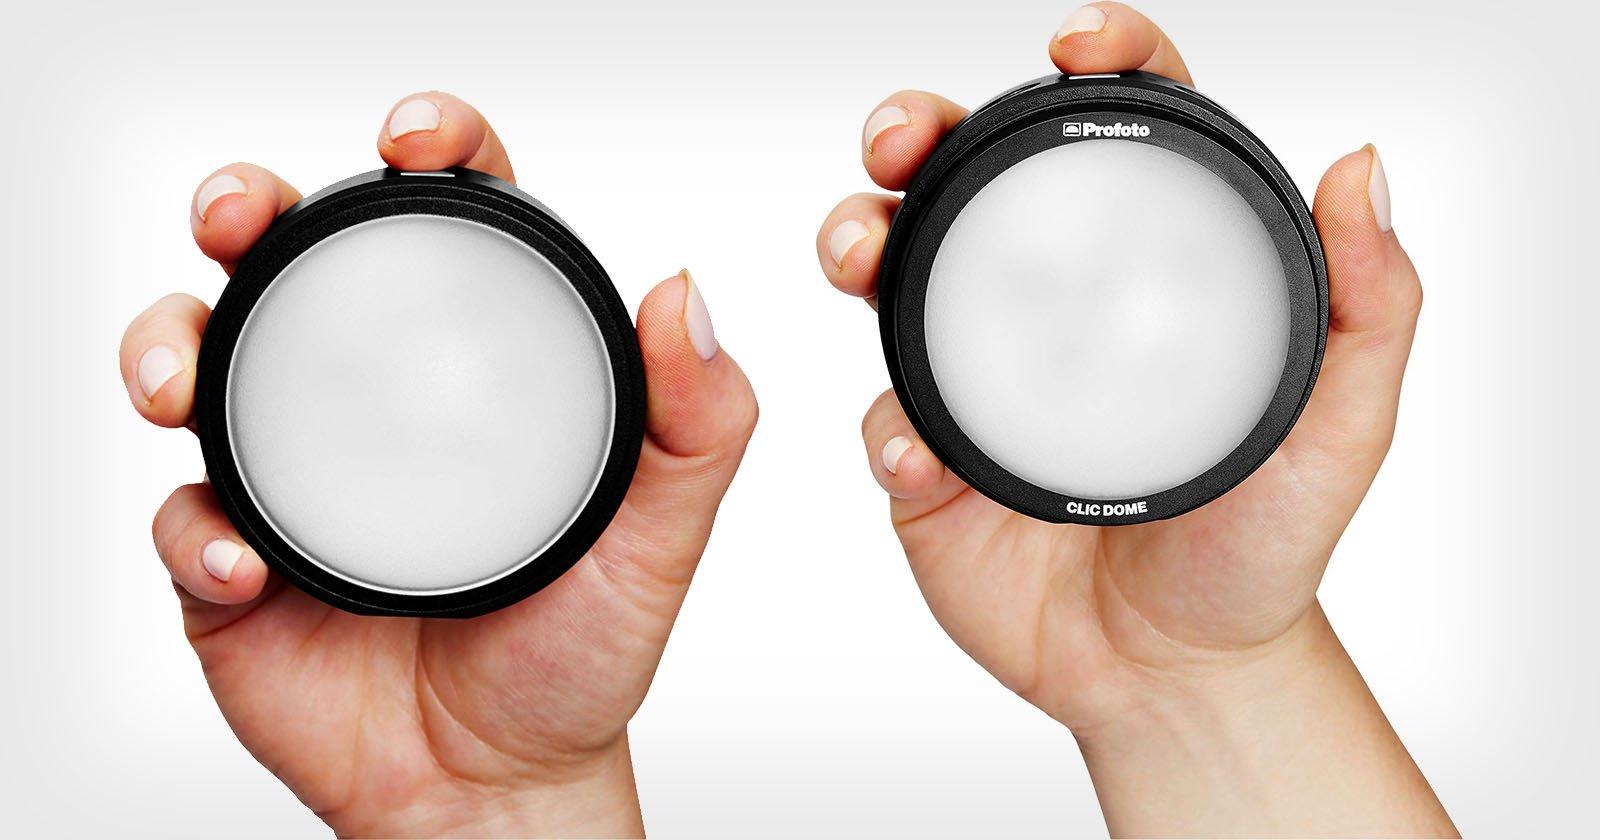 Profoto C1 and C1 Plus: Studio Lights for Smartphone Photographers